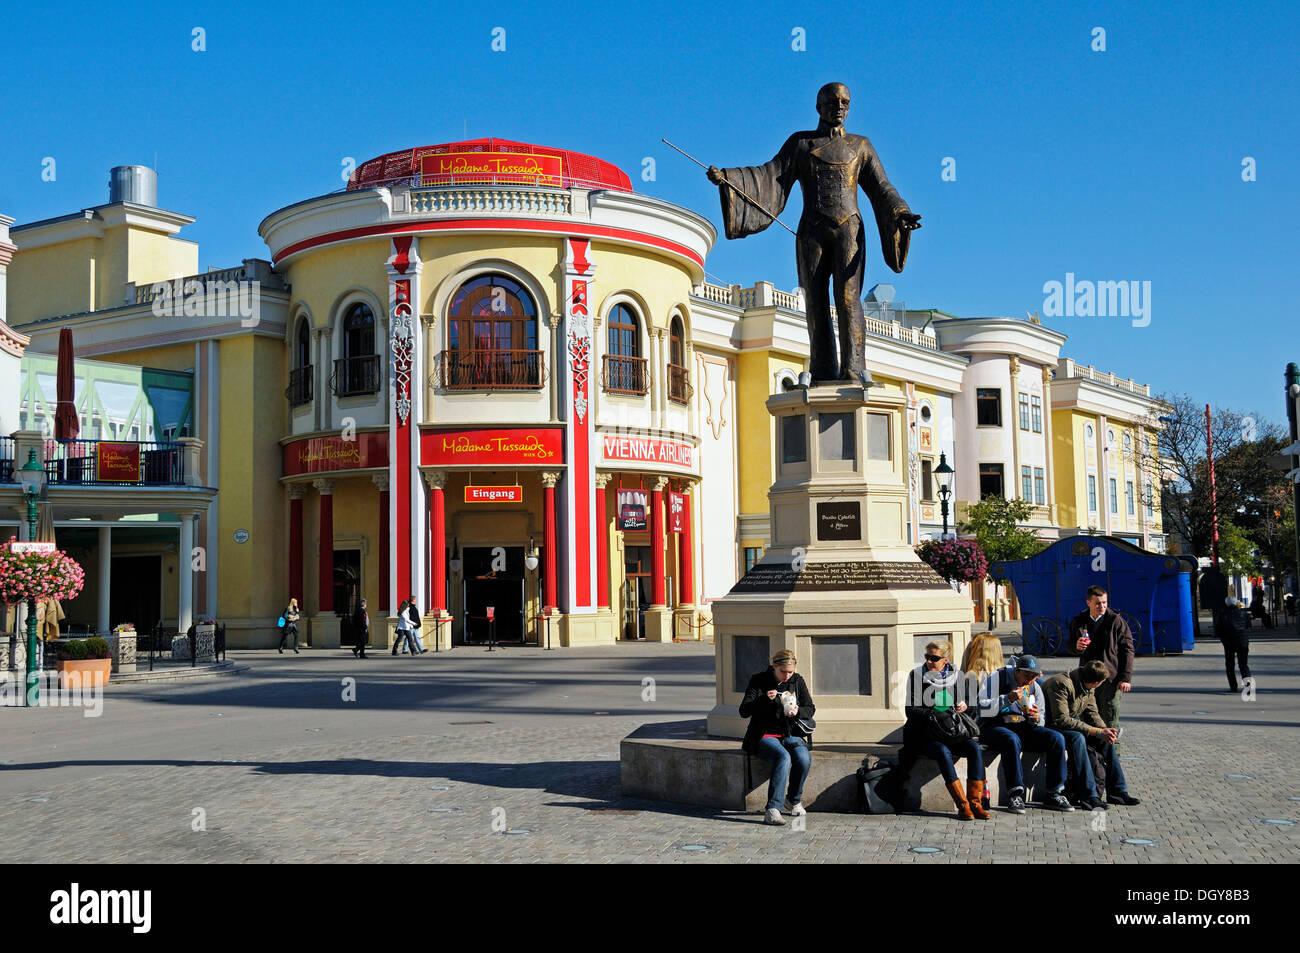 Monument of Basilio Calafati in front of Madame Tussauds Wax Museum, Prater amusement park, Vienna, Austria, Europe - Stock Image